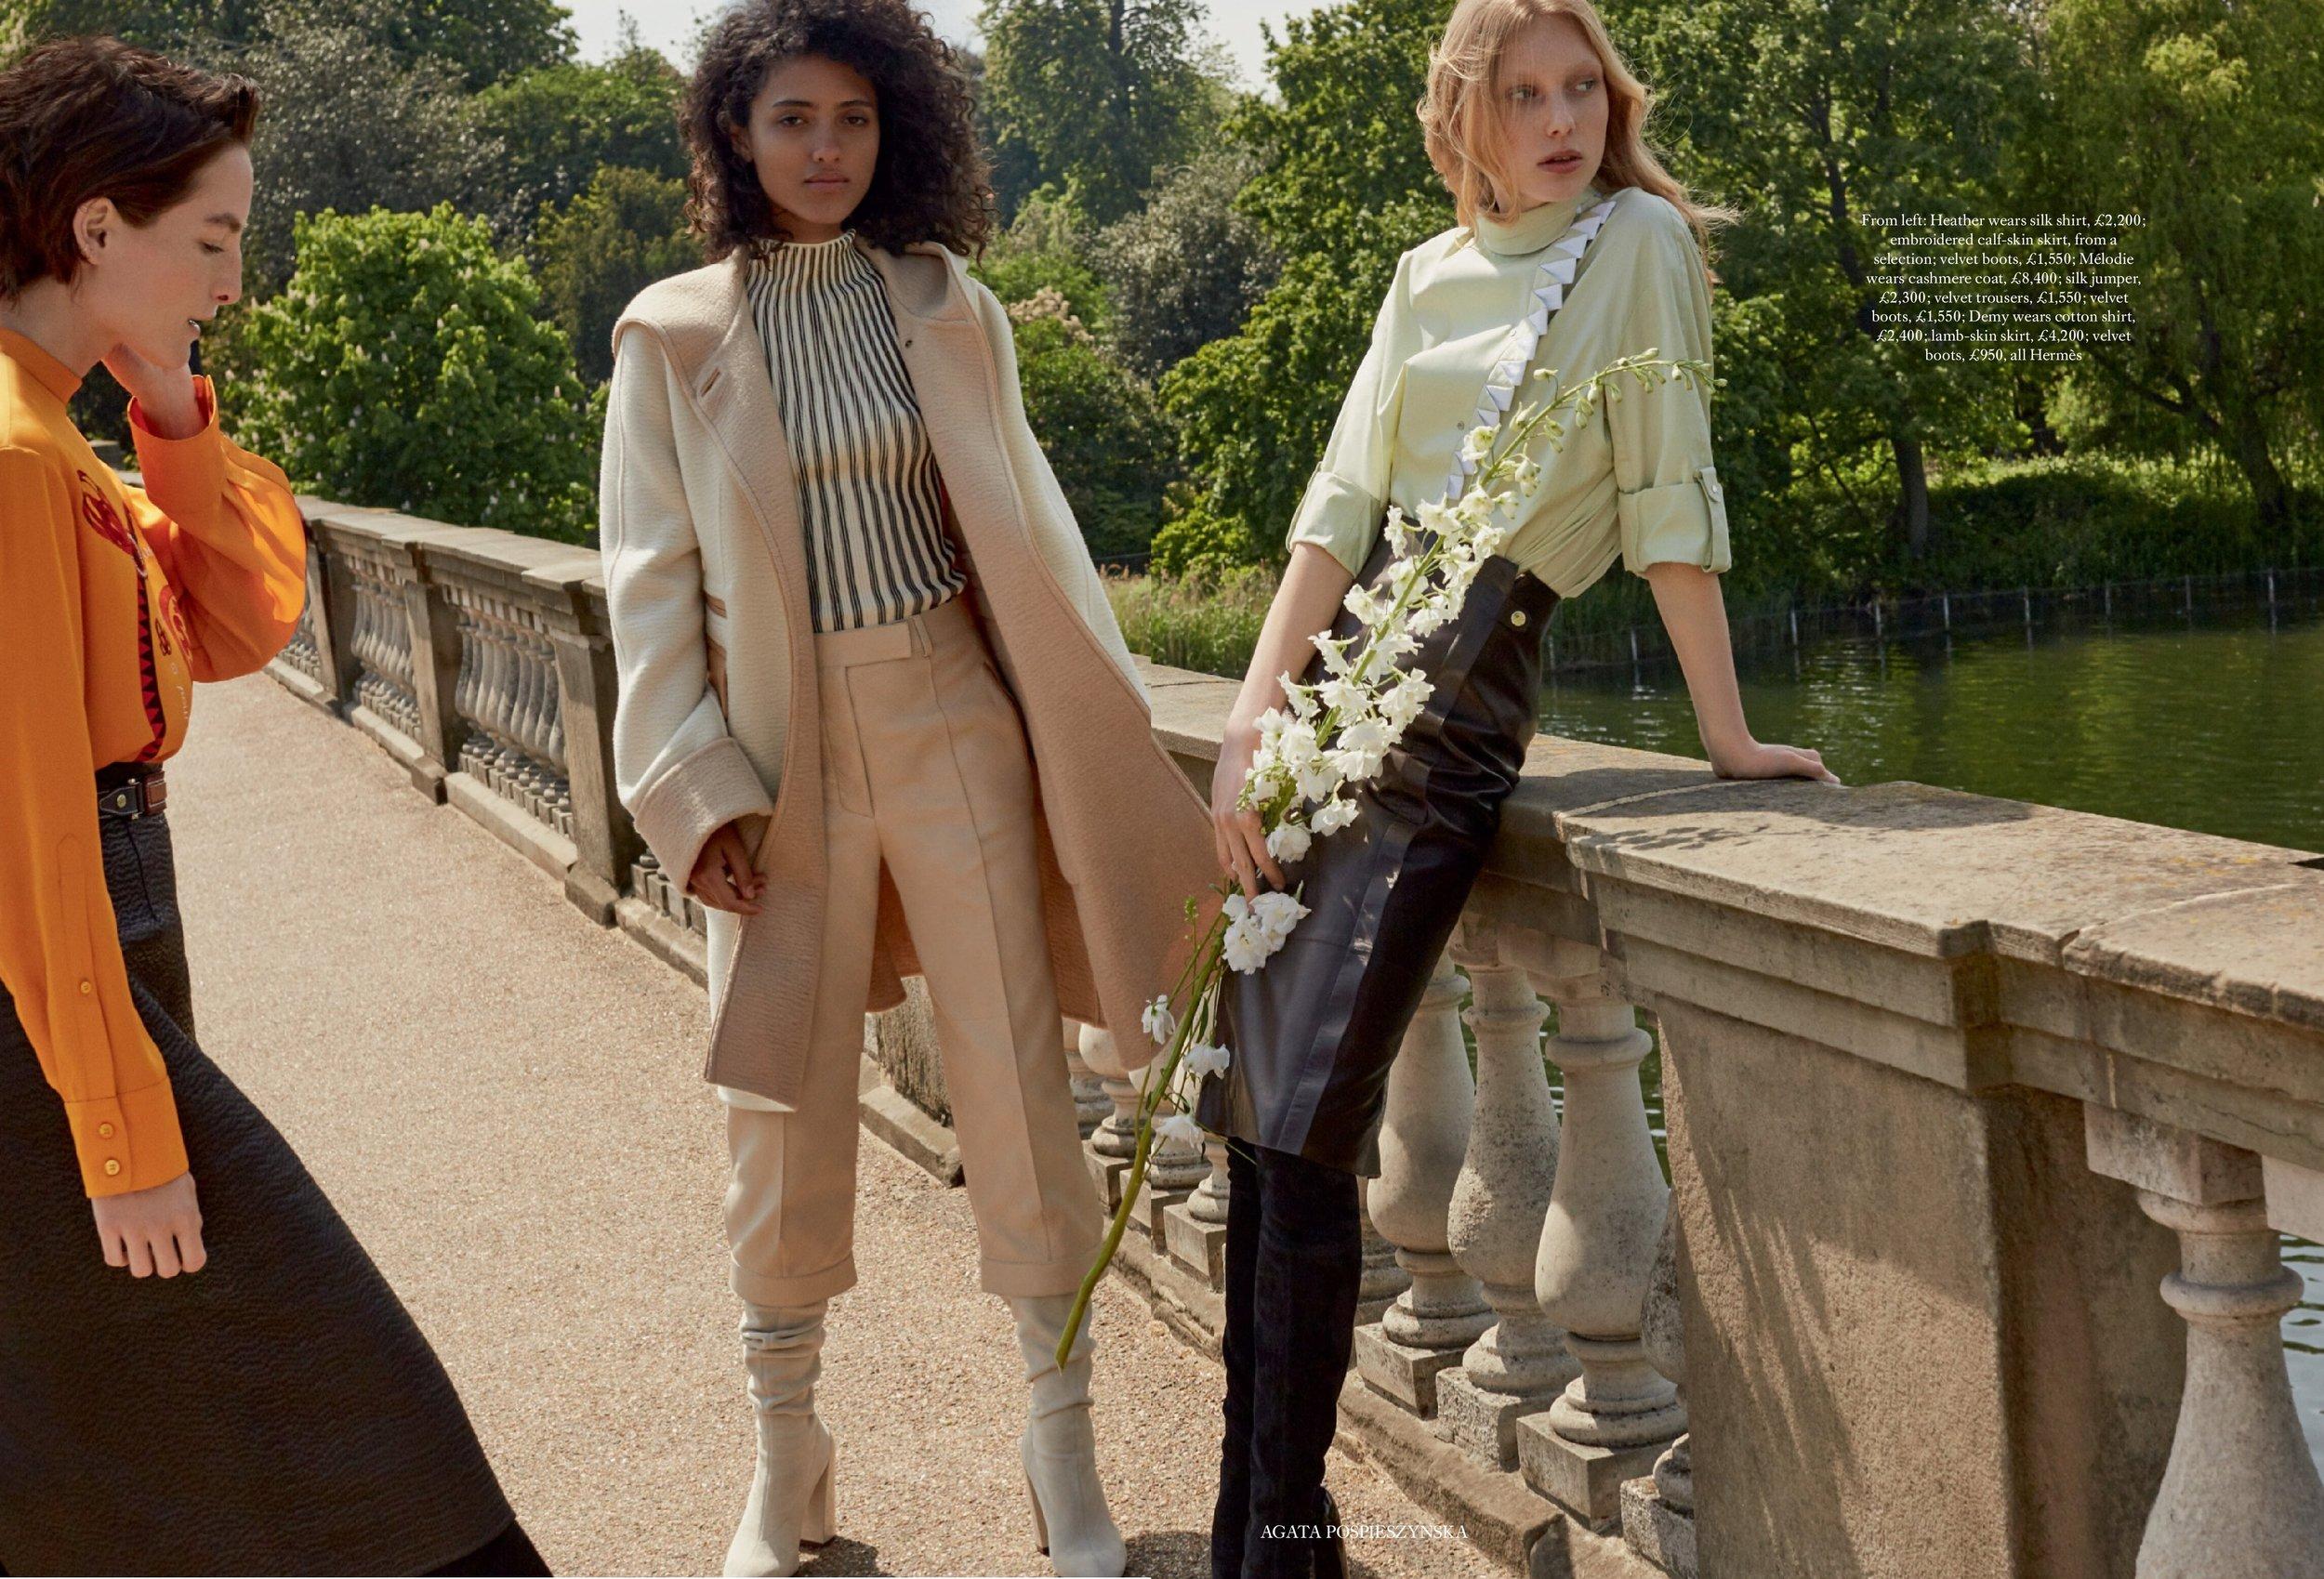 Agata Popieszynska-Girls Are Back in Town Harper's Bazaar UK Aug 2019 (28).jpg